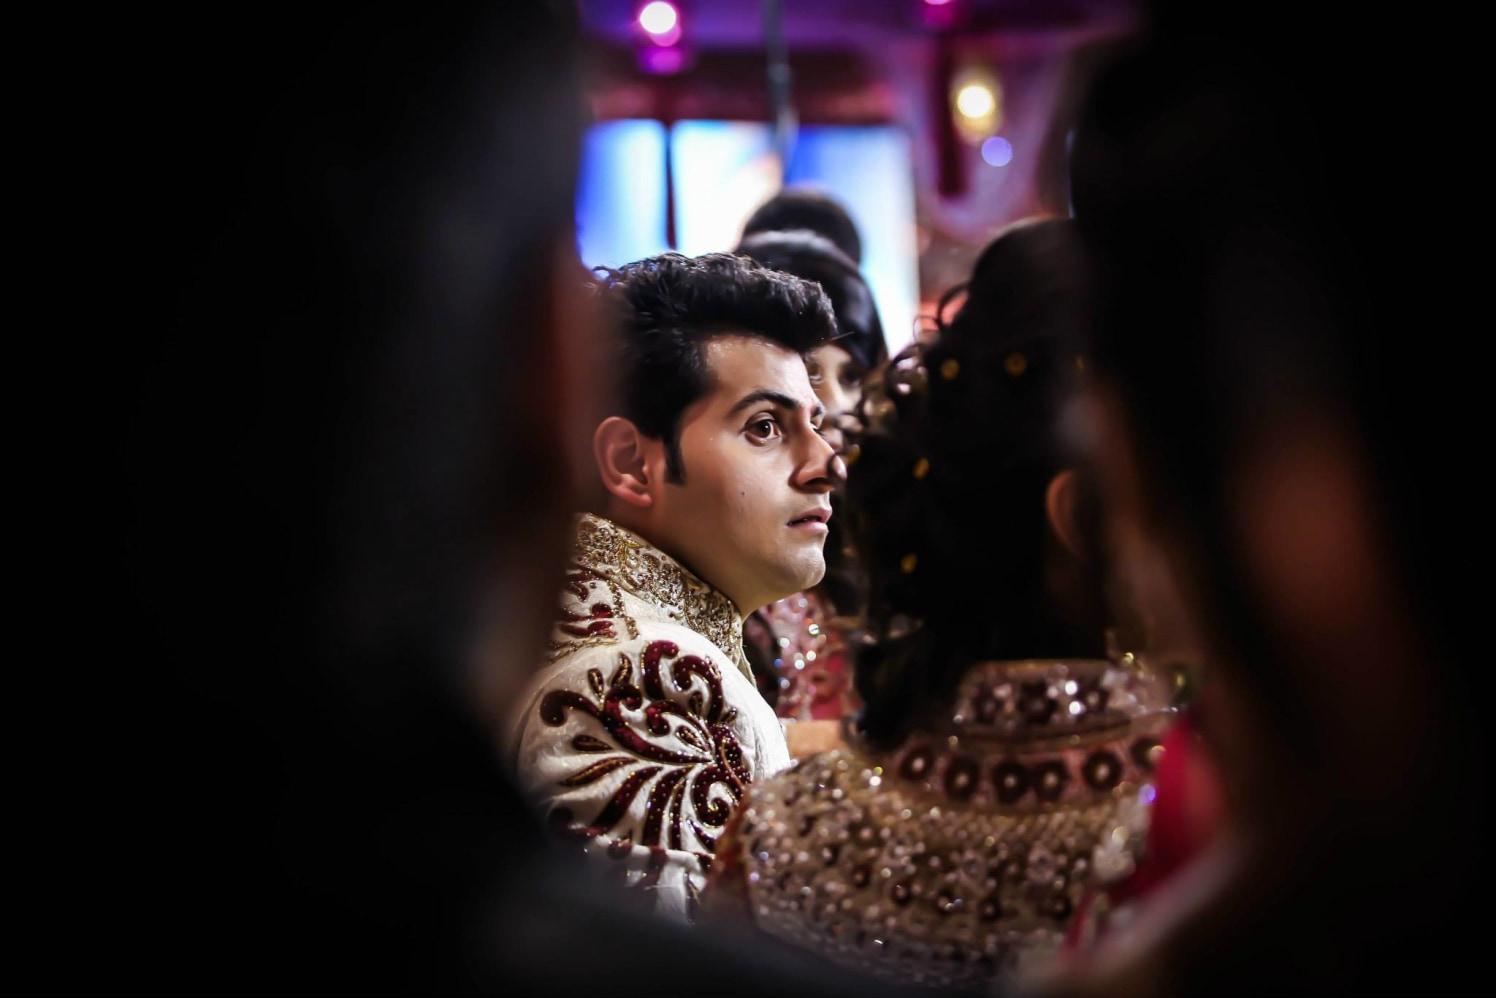 The Groom's Candid Shot by Gitesh Dhawan Wedding-photography | Weddings Photos & Ideas